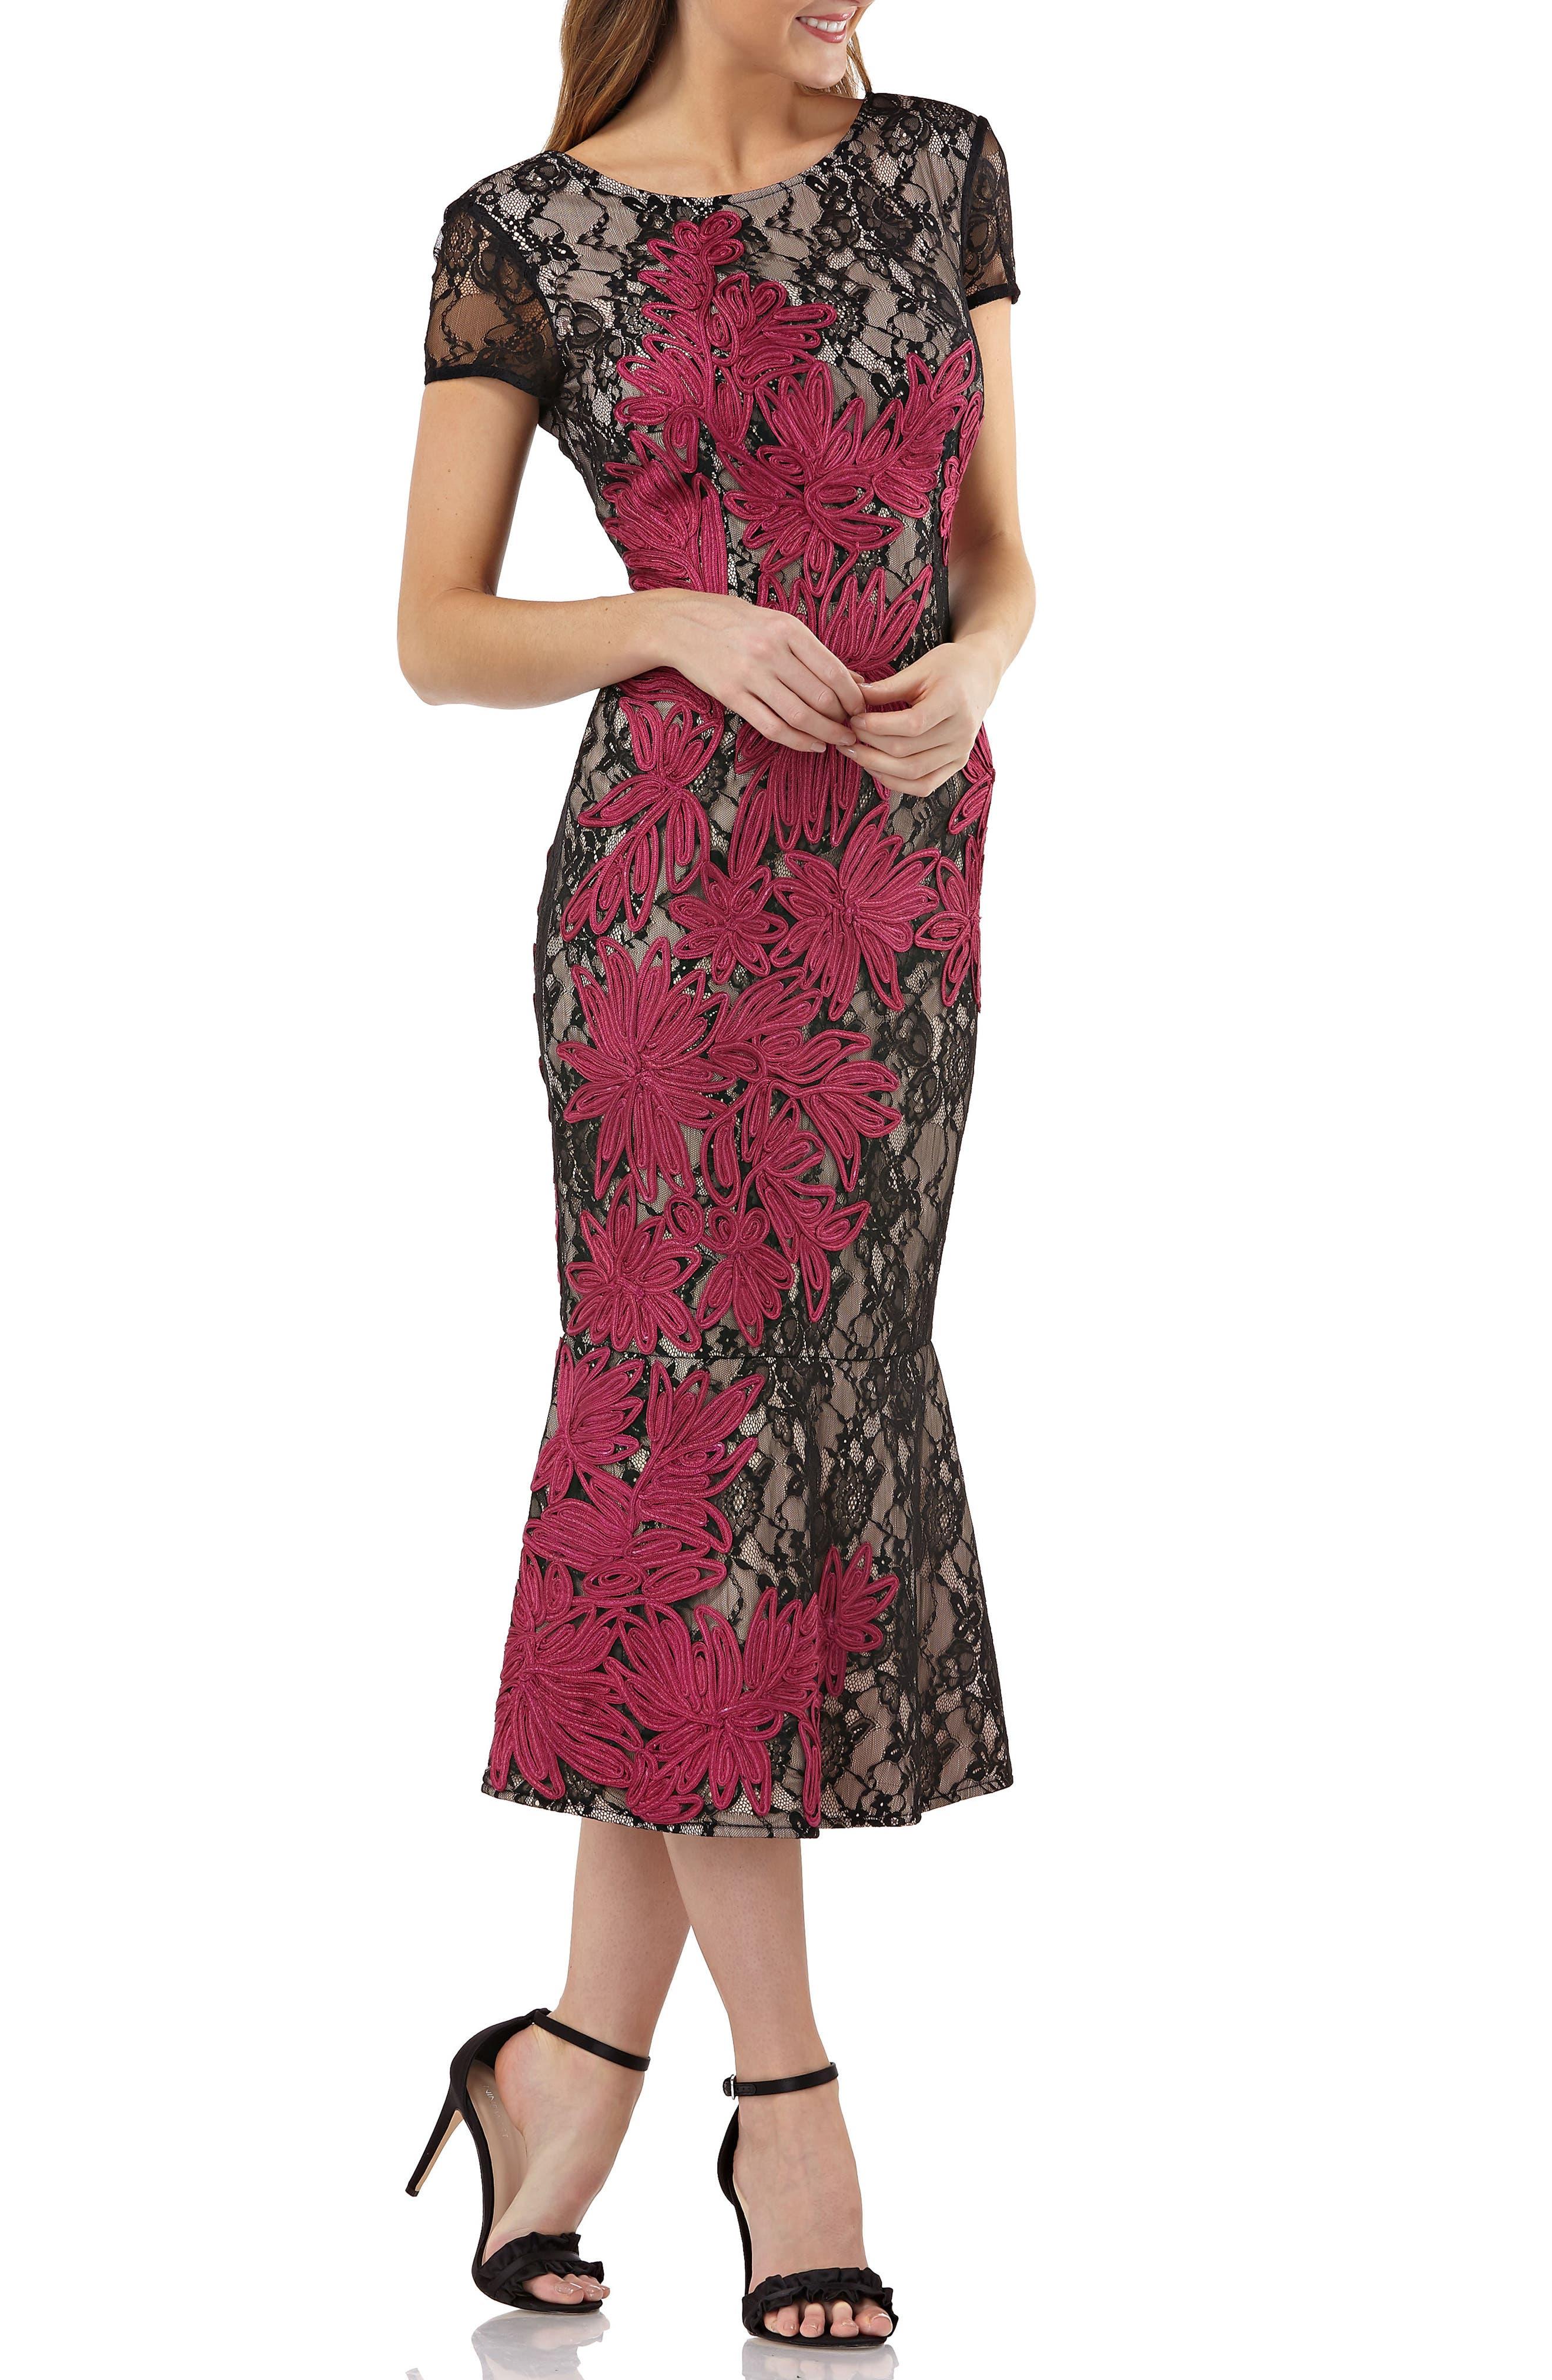 JS COLLECTIONS, Soutache Embroidered Lace Dress, Main thumbnail 1, color, BLACK/ MAGENTA